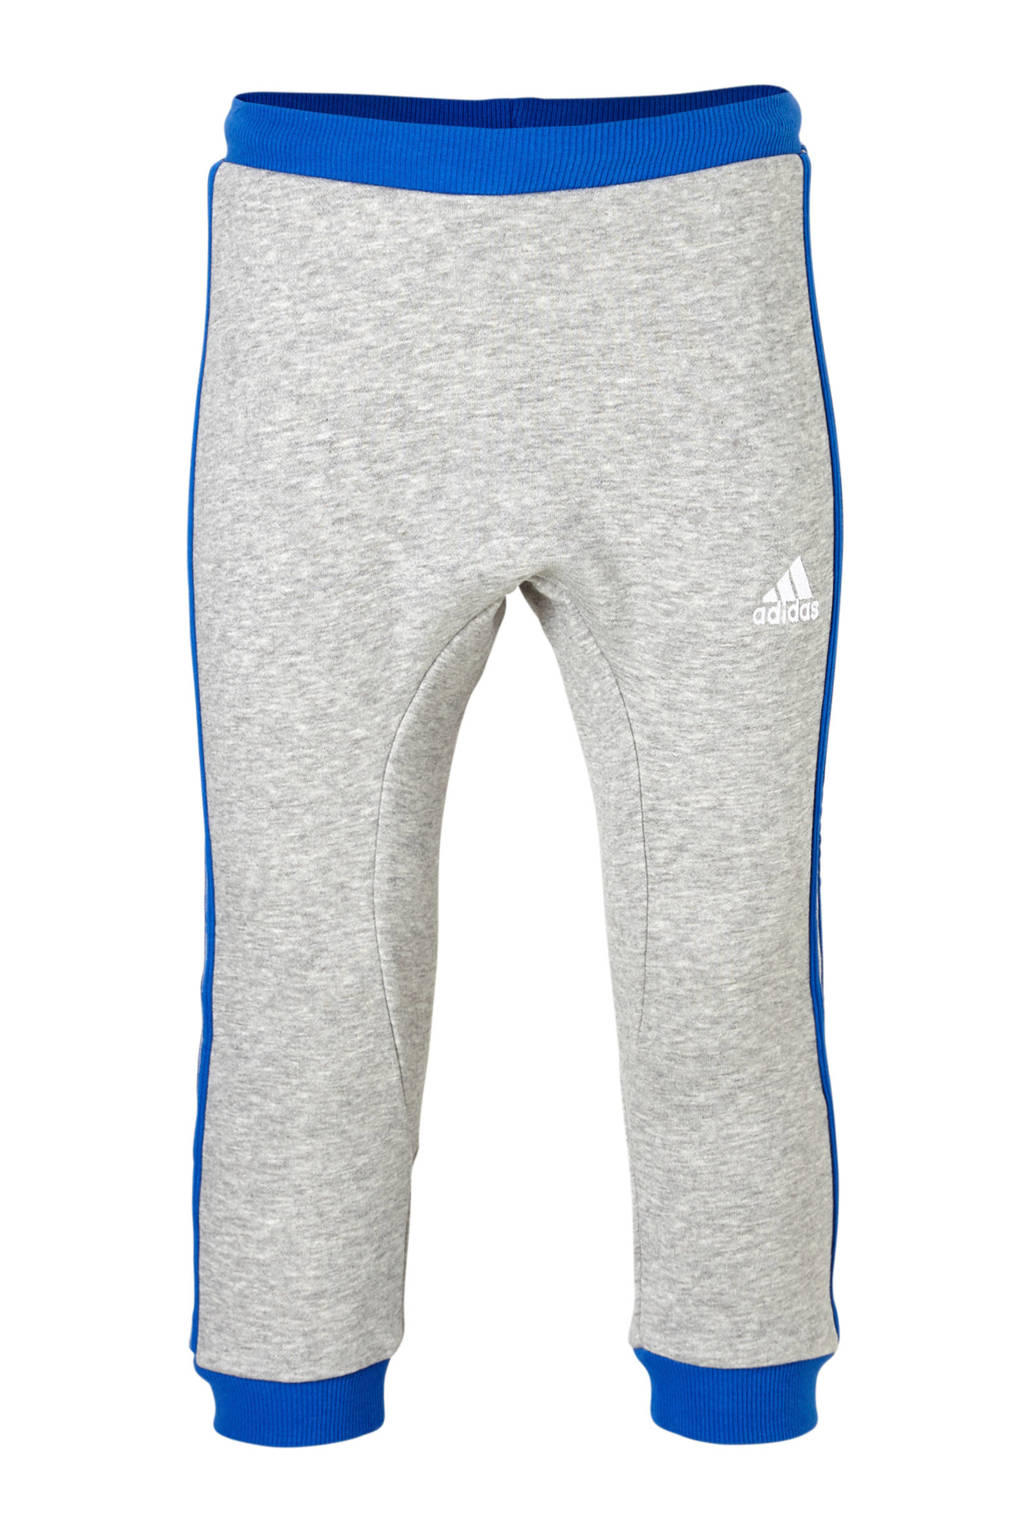 adidas performance   joggingbroek blauw, Lichtgrijs/blauw